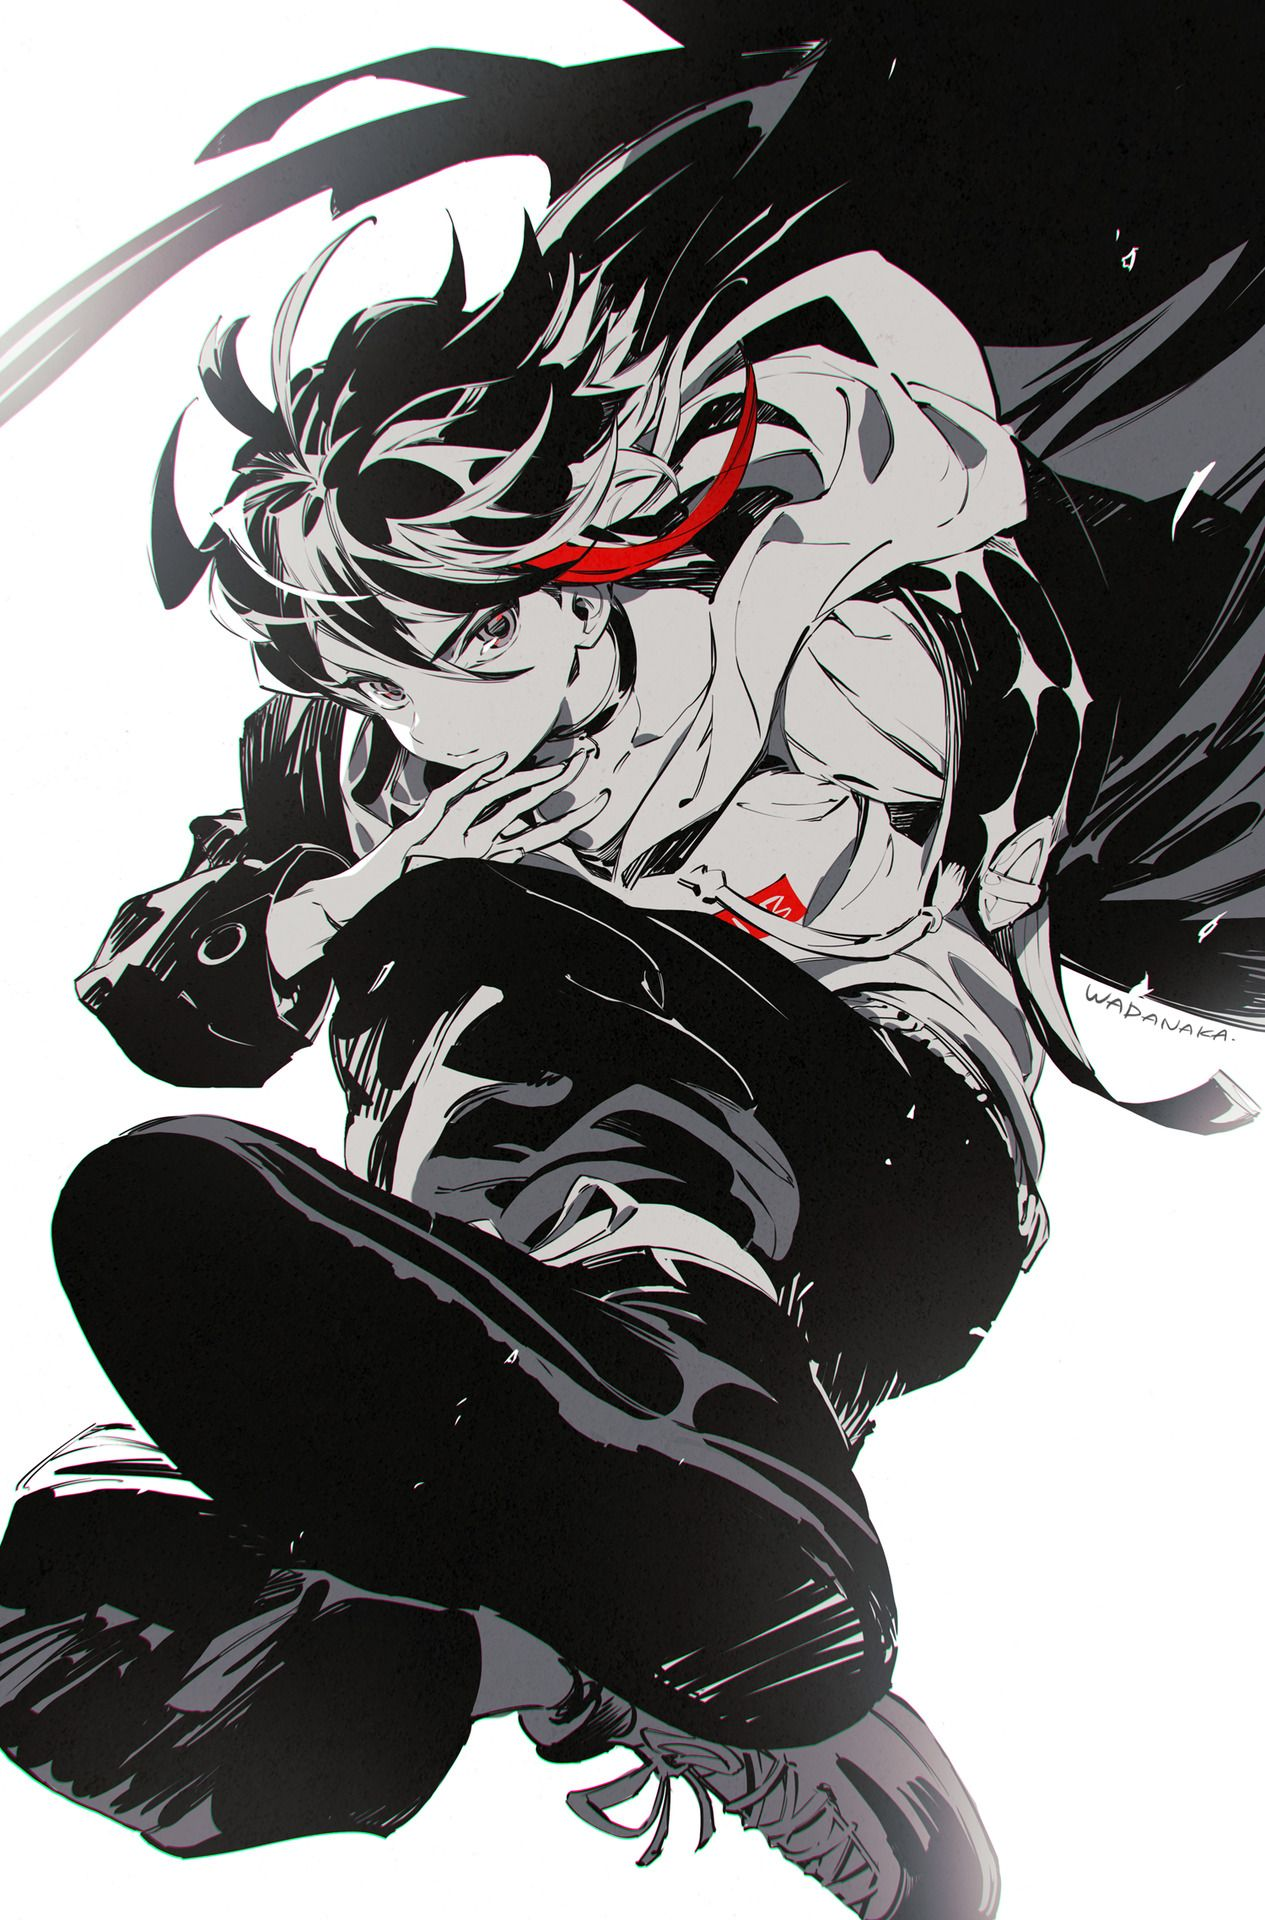 wadanaka 三枝明那くんにじさんじ Vtuber 2019 Anime, Anime art